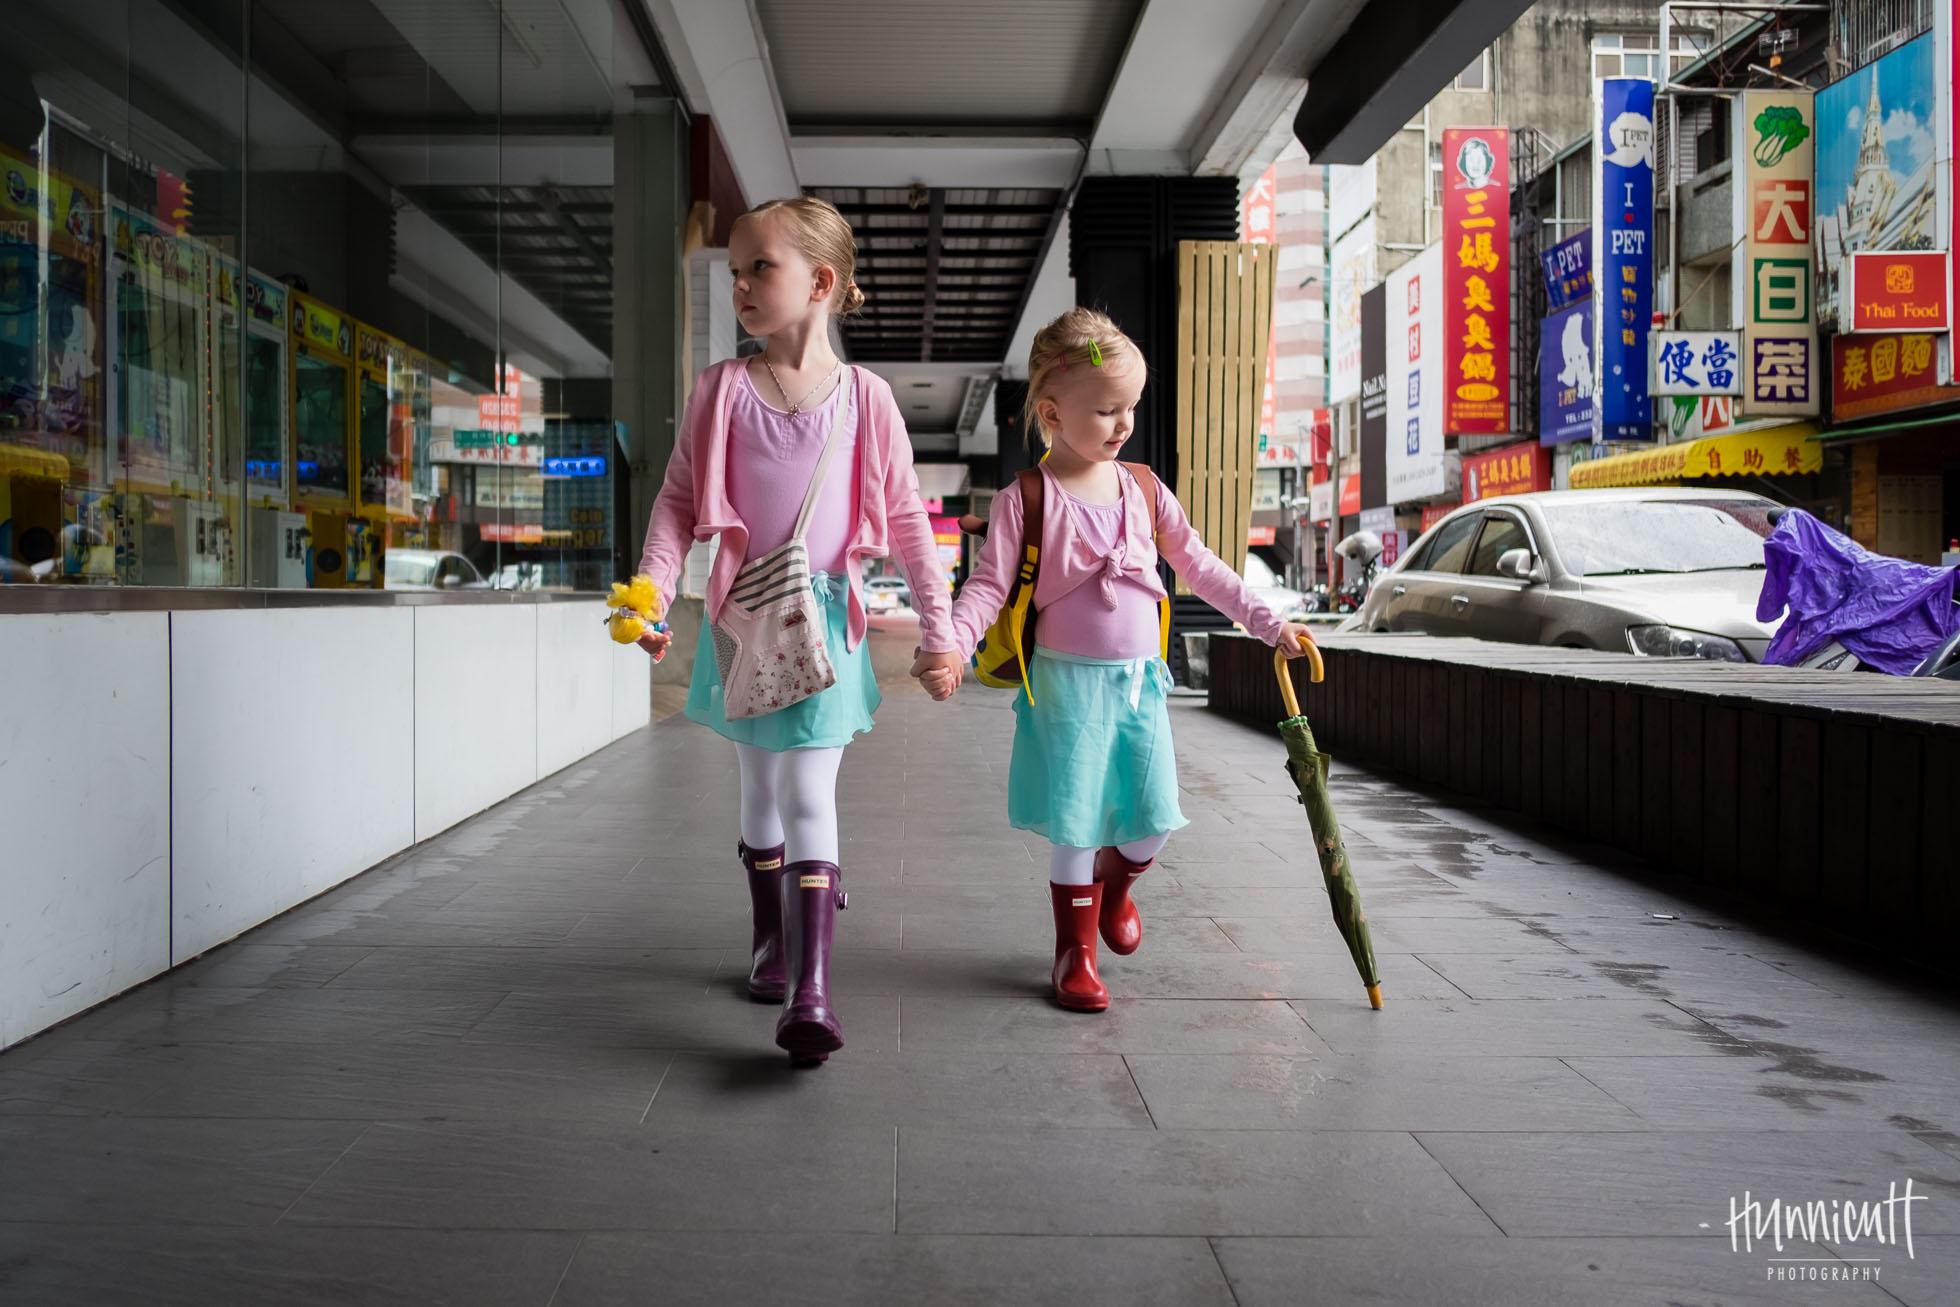 Child, Documentary, Everyday by Rebecca Hunnicutt Farren with Fujifilm 18mm f/2.0 XF R